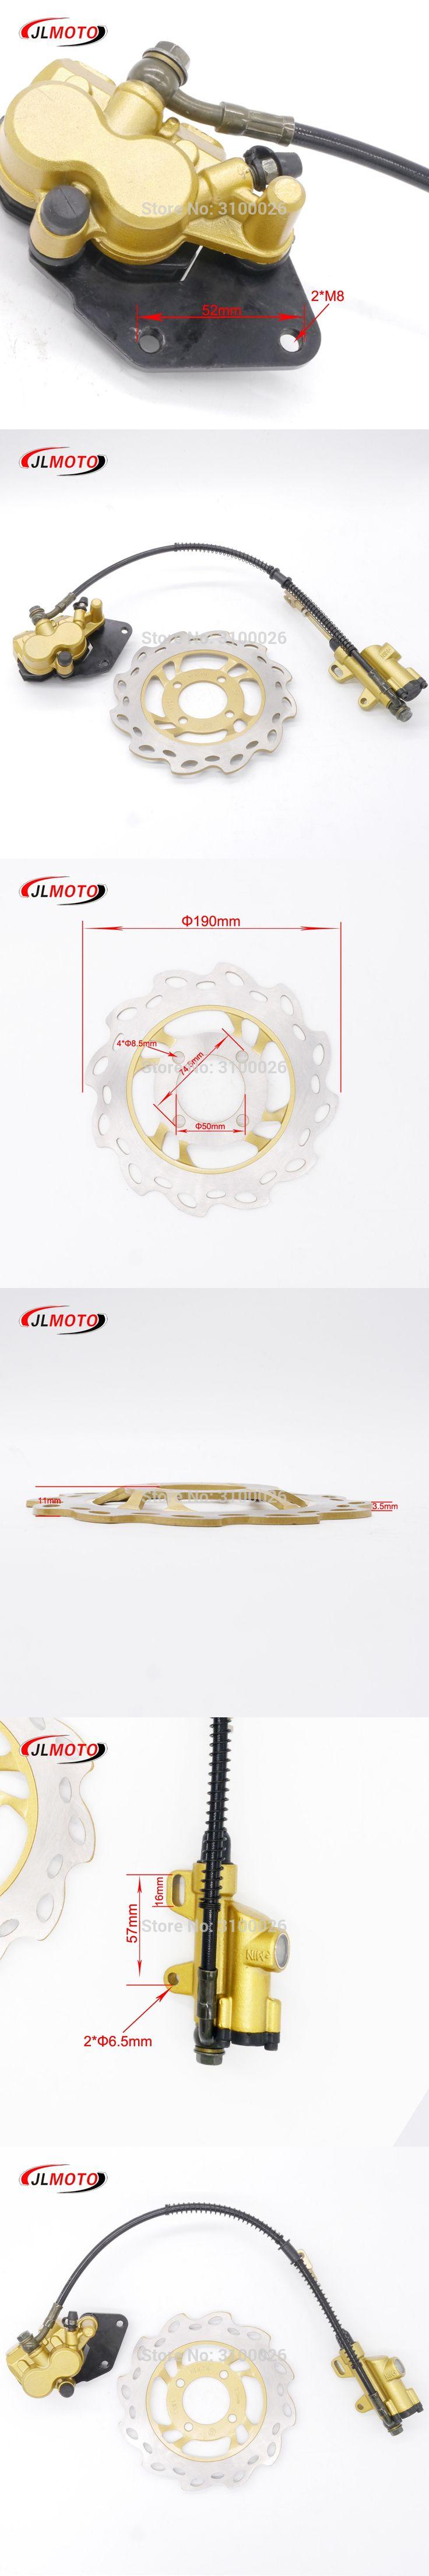 1Set Rear Foot Hydraulic Disc Brake /50cm Brake line/190mm Disc Fit For 50cc 110cc 150cc dirt bike Pit Bike Scooter ATV Parts